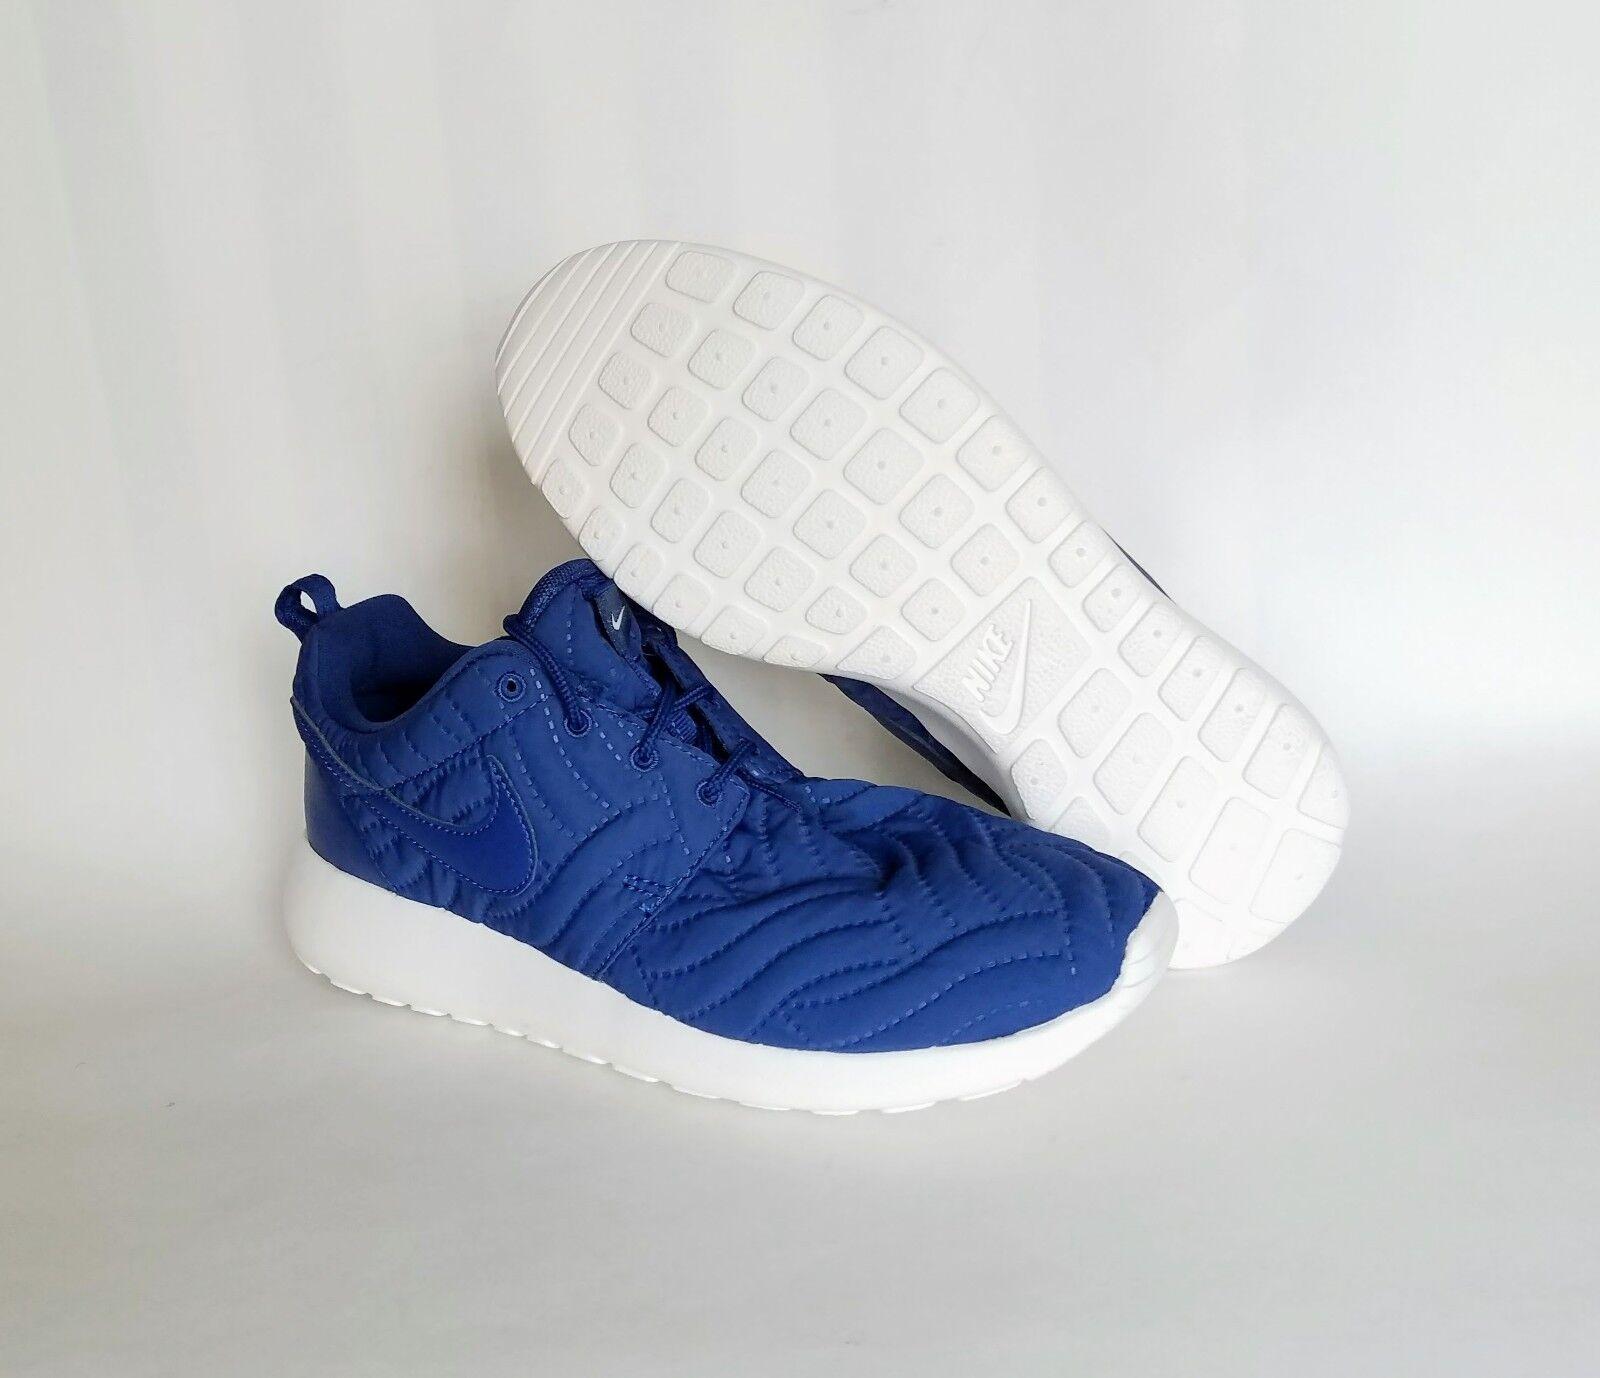 Nike Womens Roshe One Premium Blue 833928 400 Sz 6